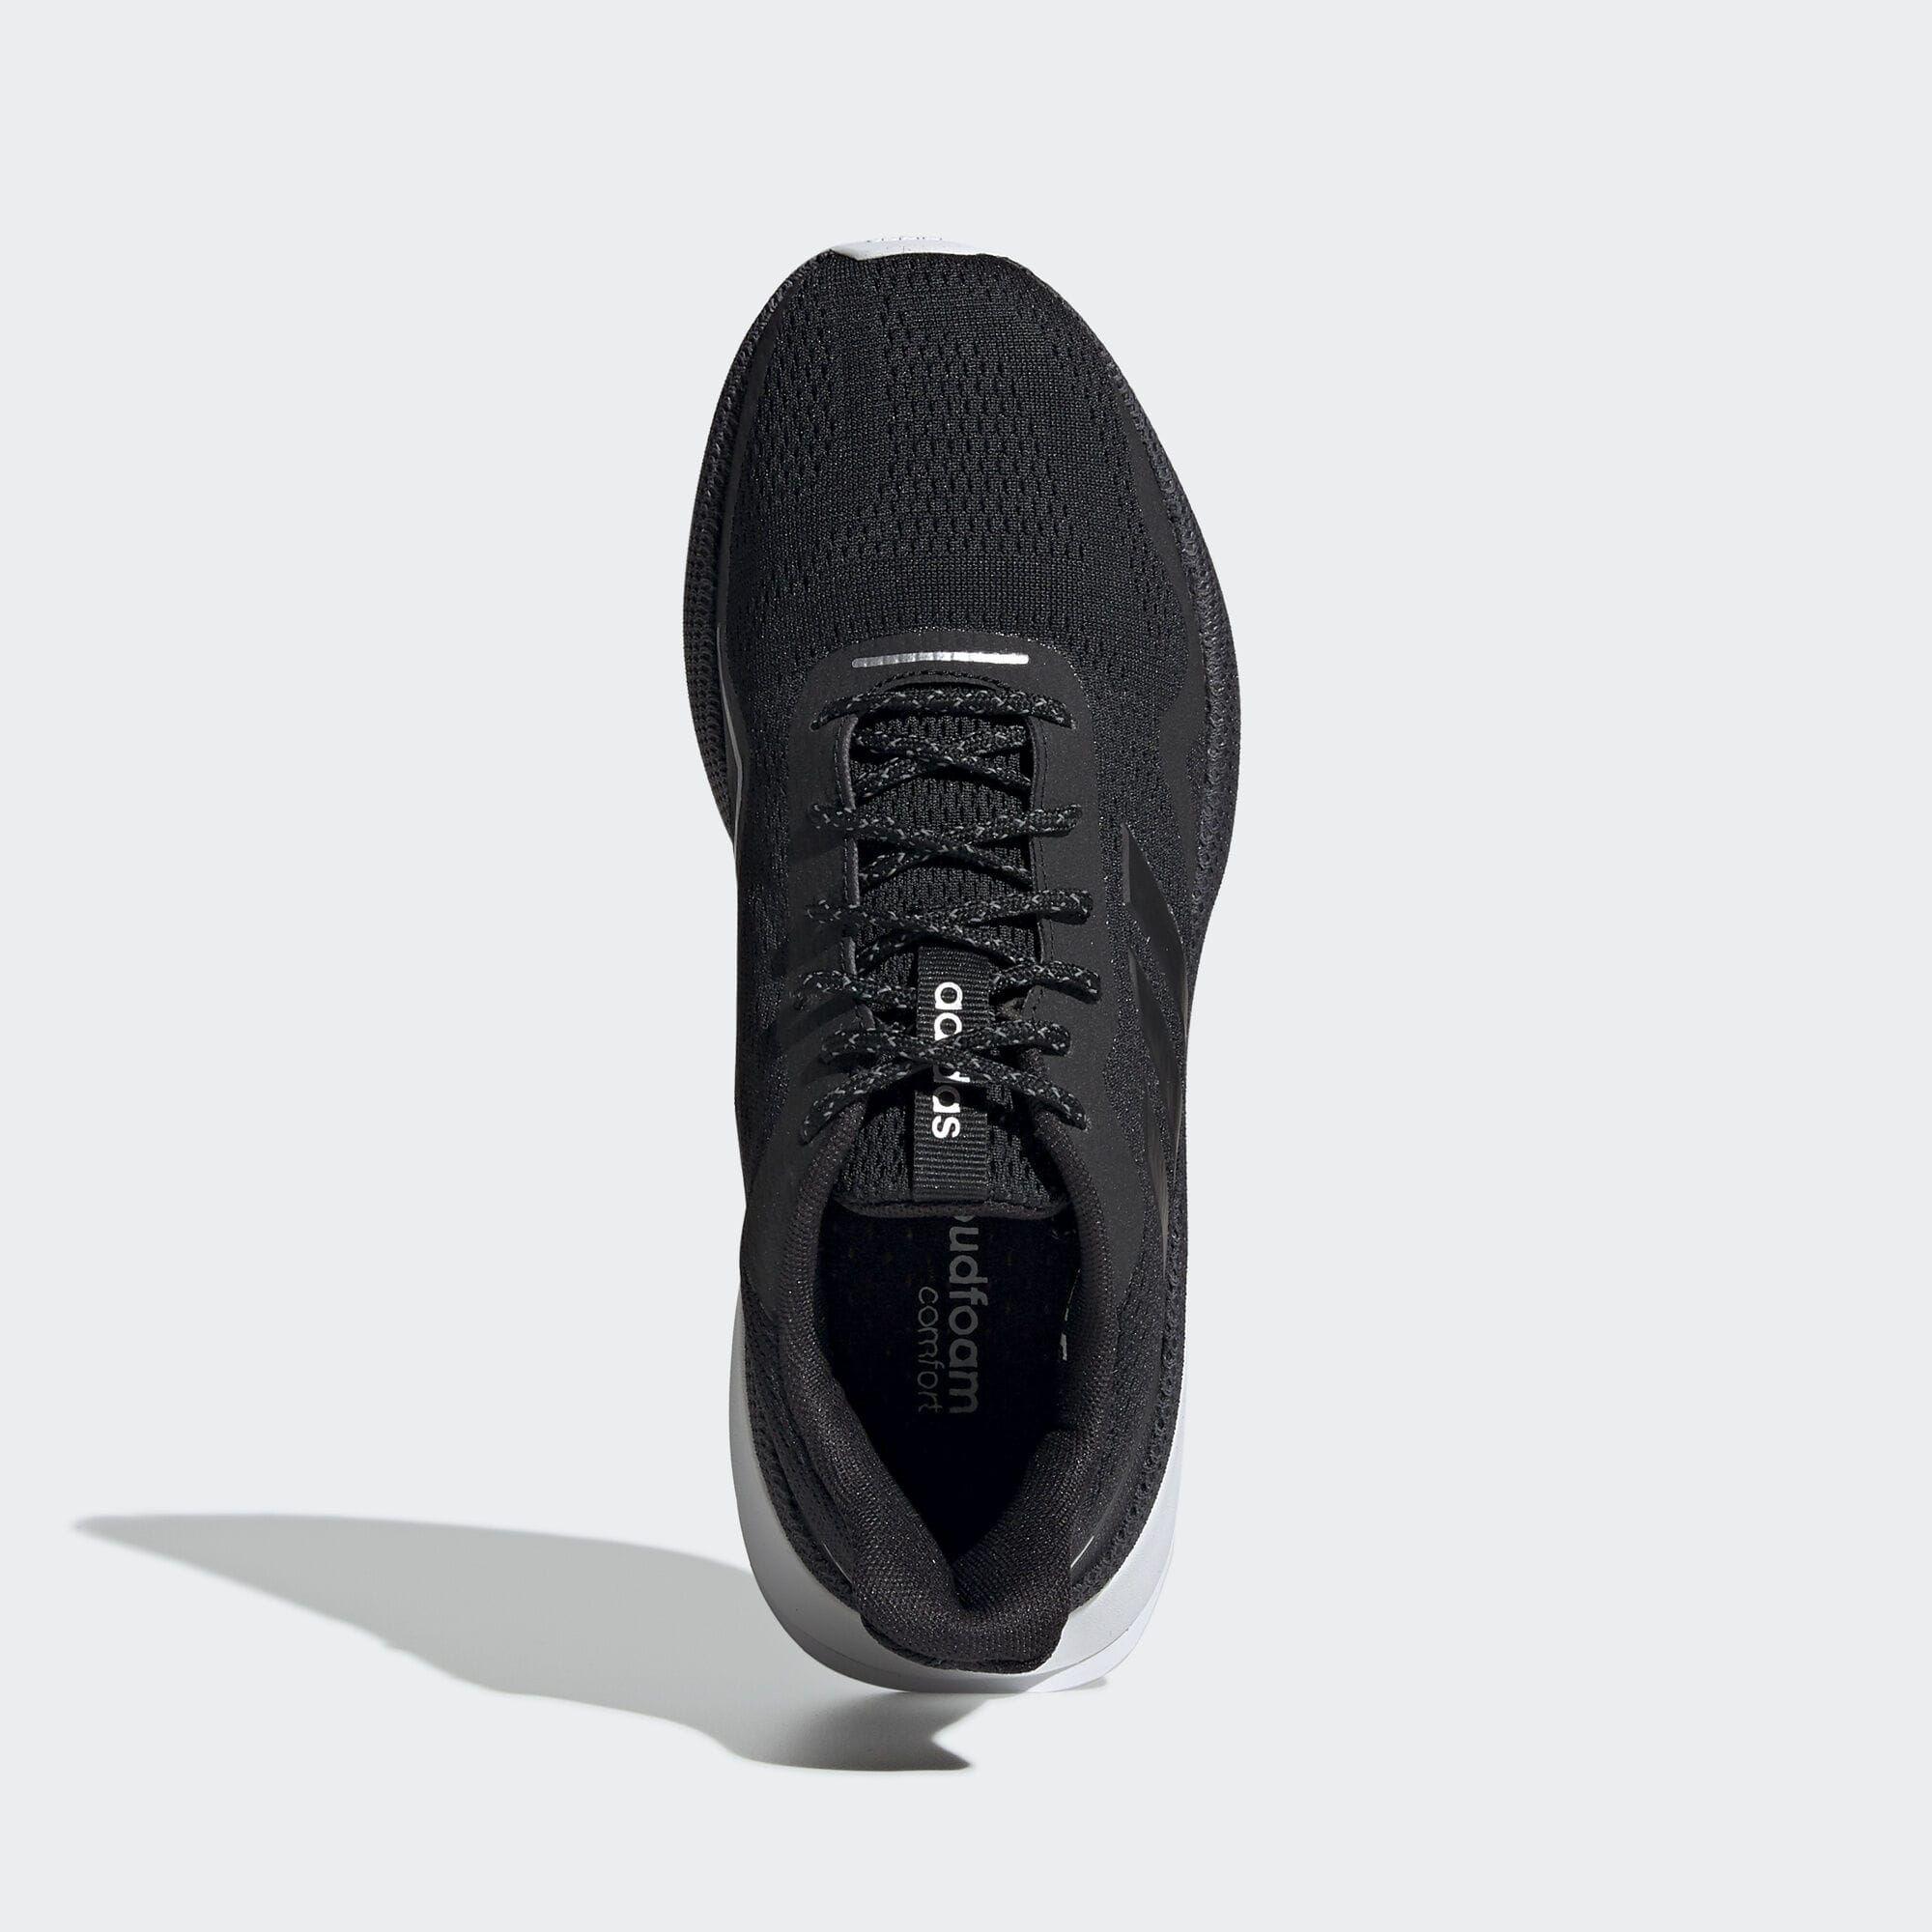 ADIDAS PERFORMANCE Shoes 'Nova Run X' Herren, Schwarz, Größe